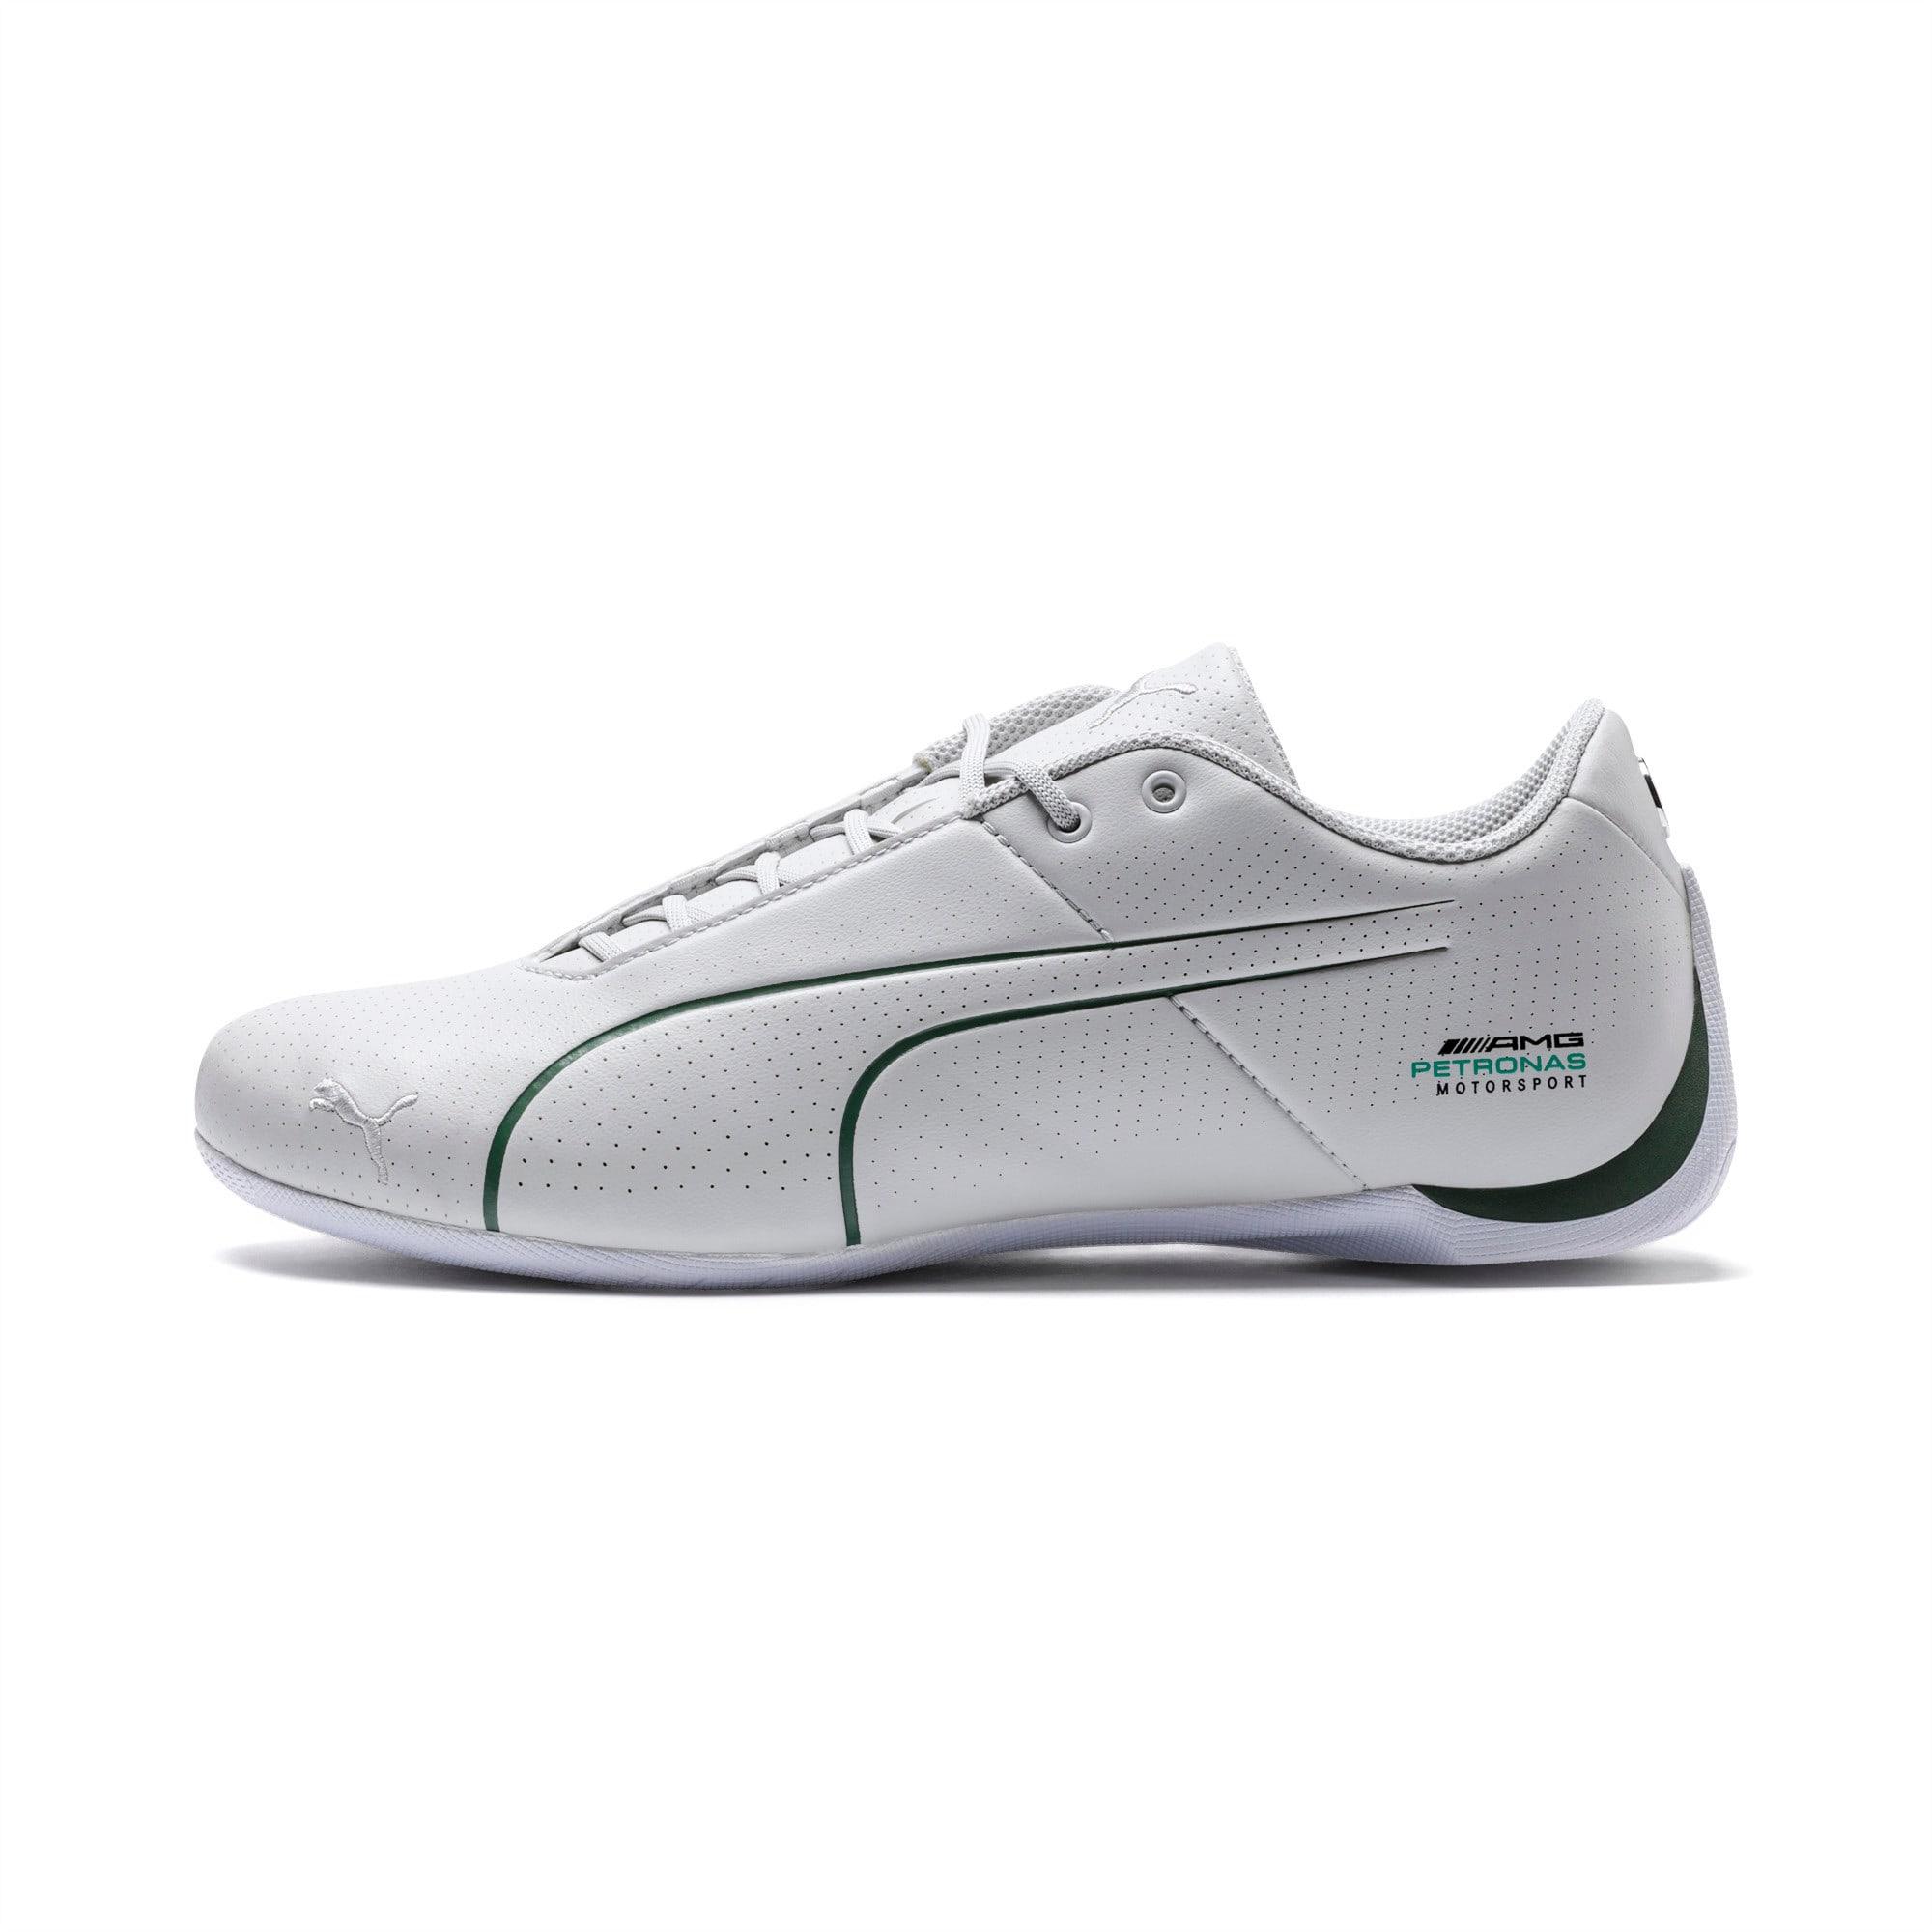 MERCEDES AMG PETRONAS Future Cat Ultra Shoes